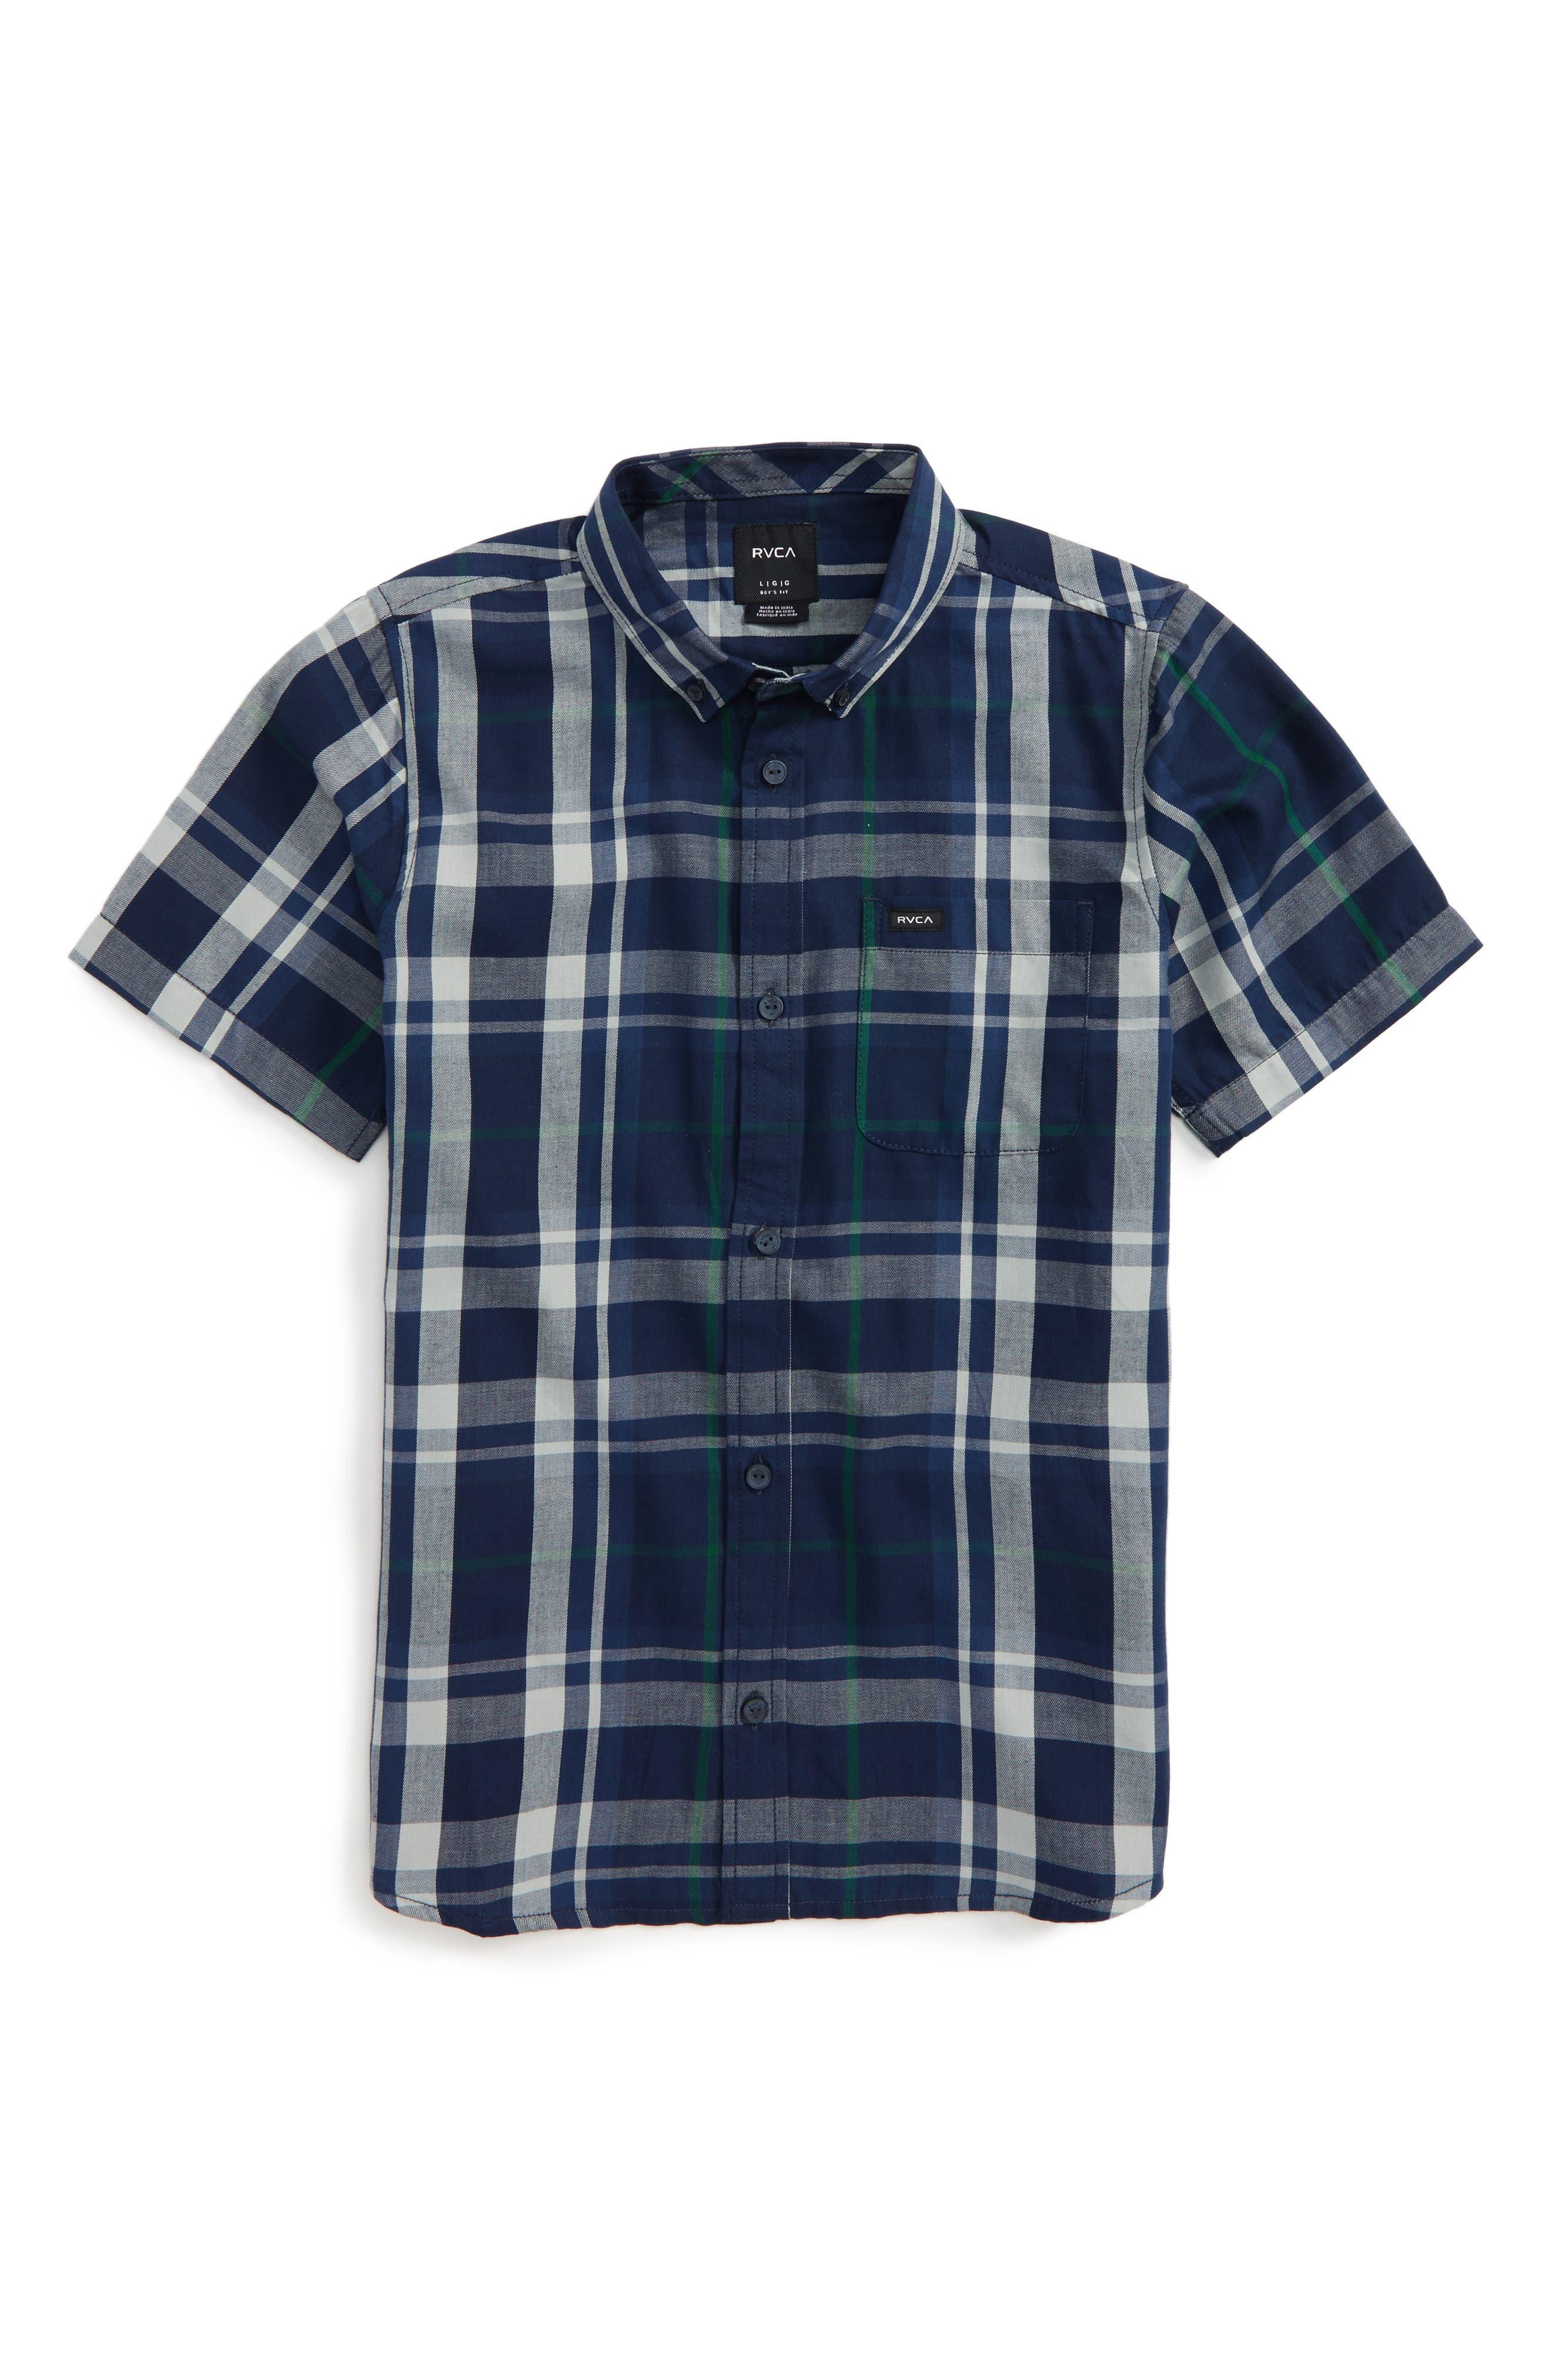 Main Image - RVCA Plaid Woven Shirt (Big Boys)